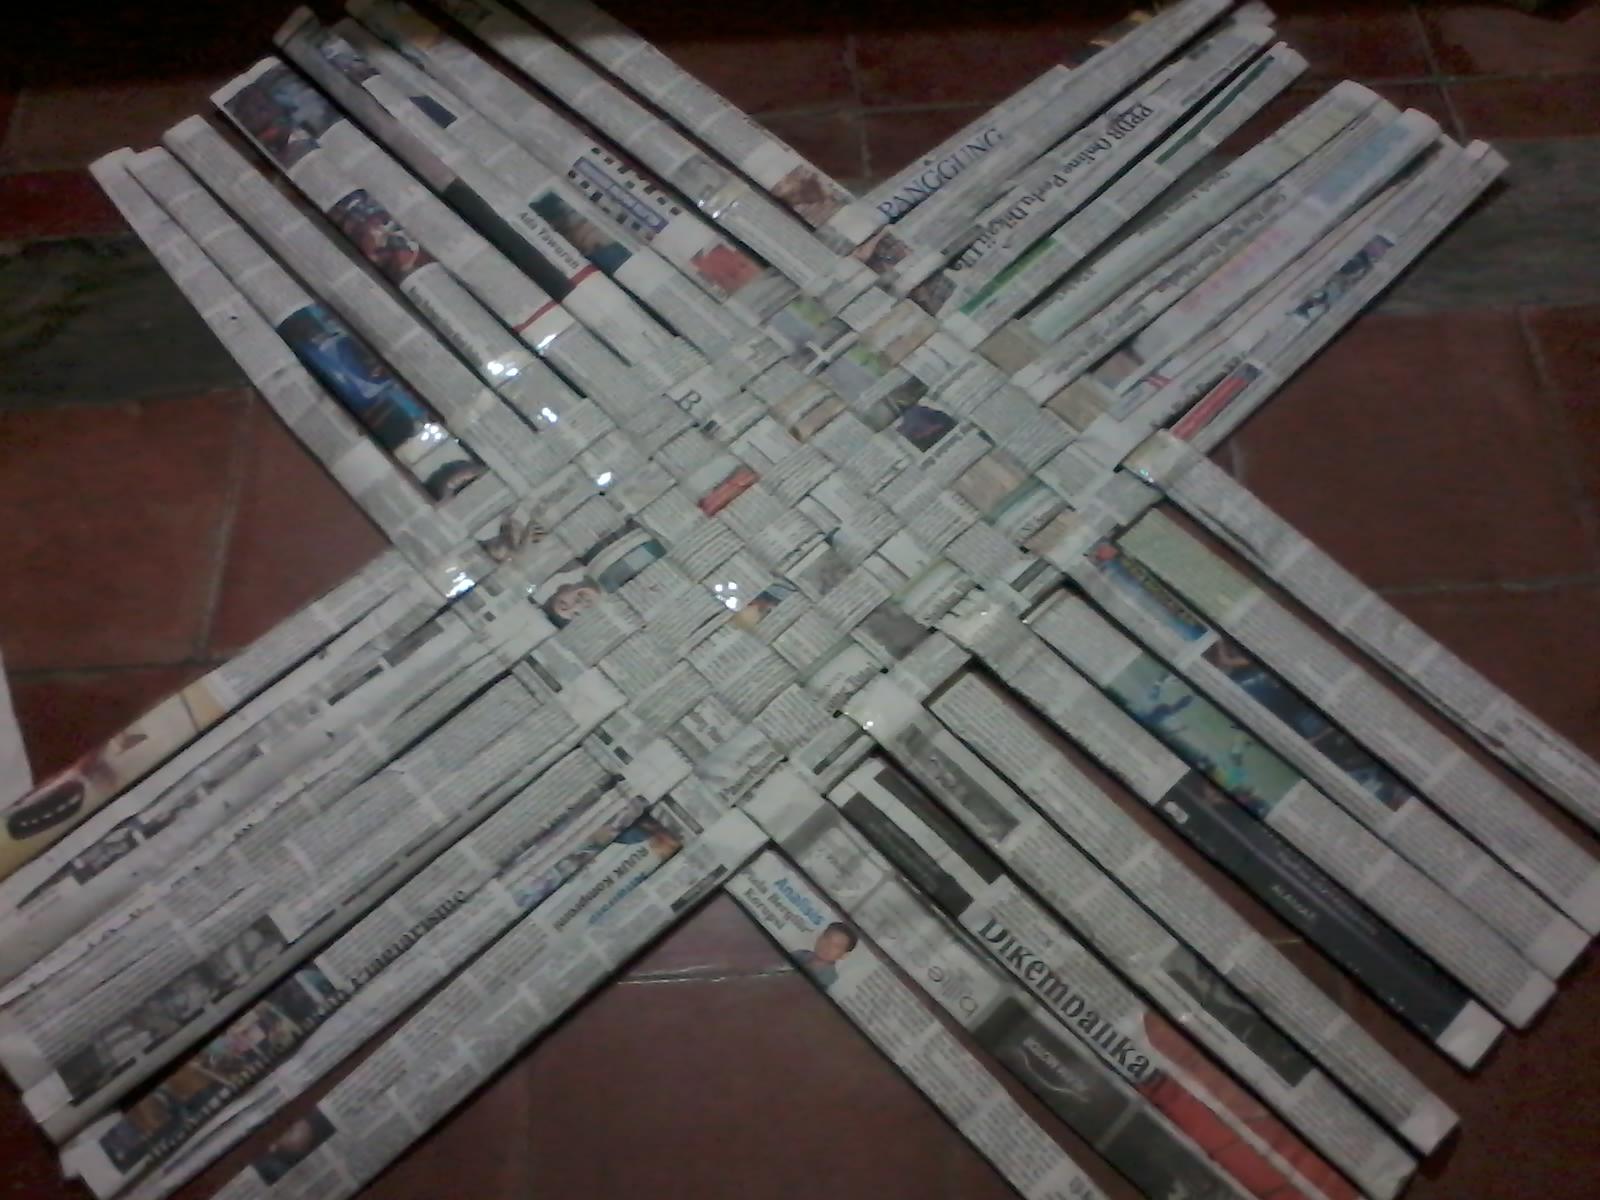 Membuat berbagai macam kerajinan tangan sederhana dari bahan koran